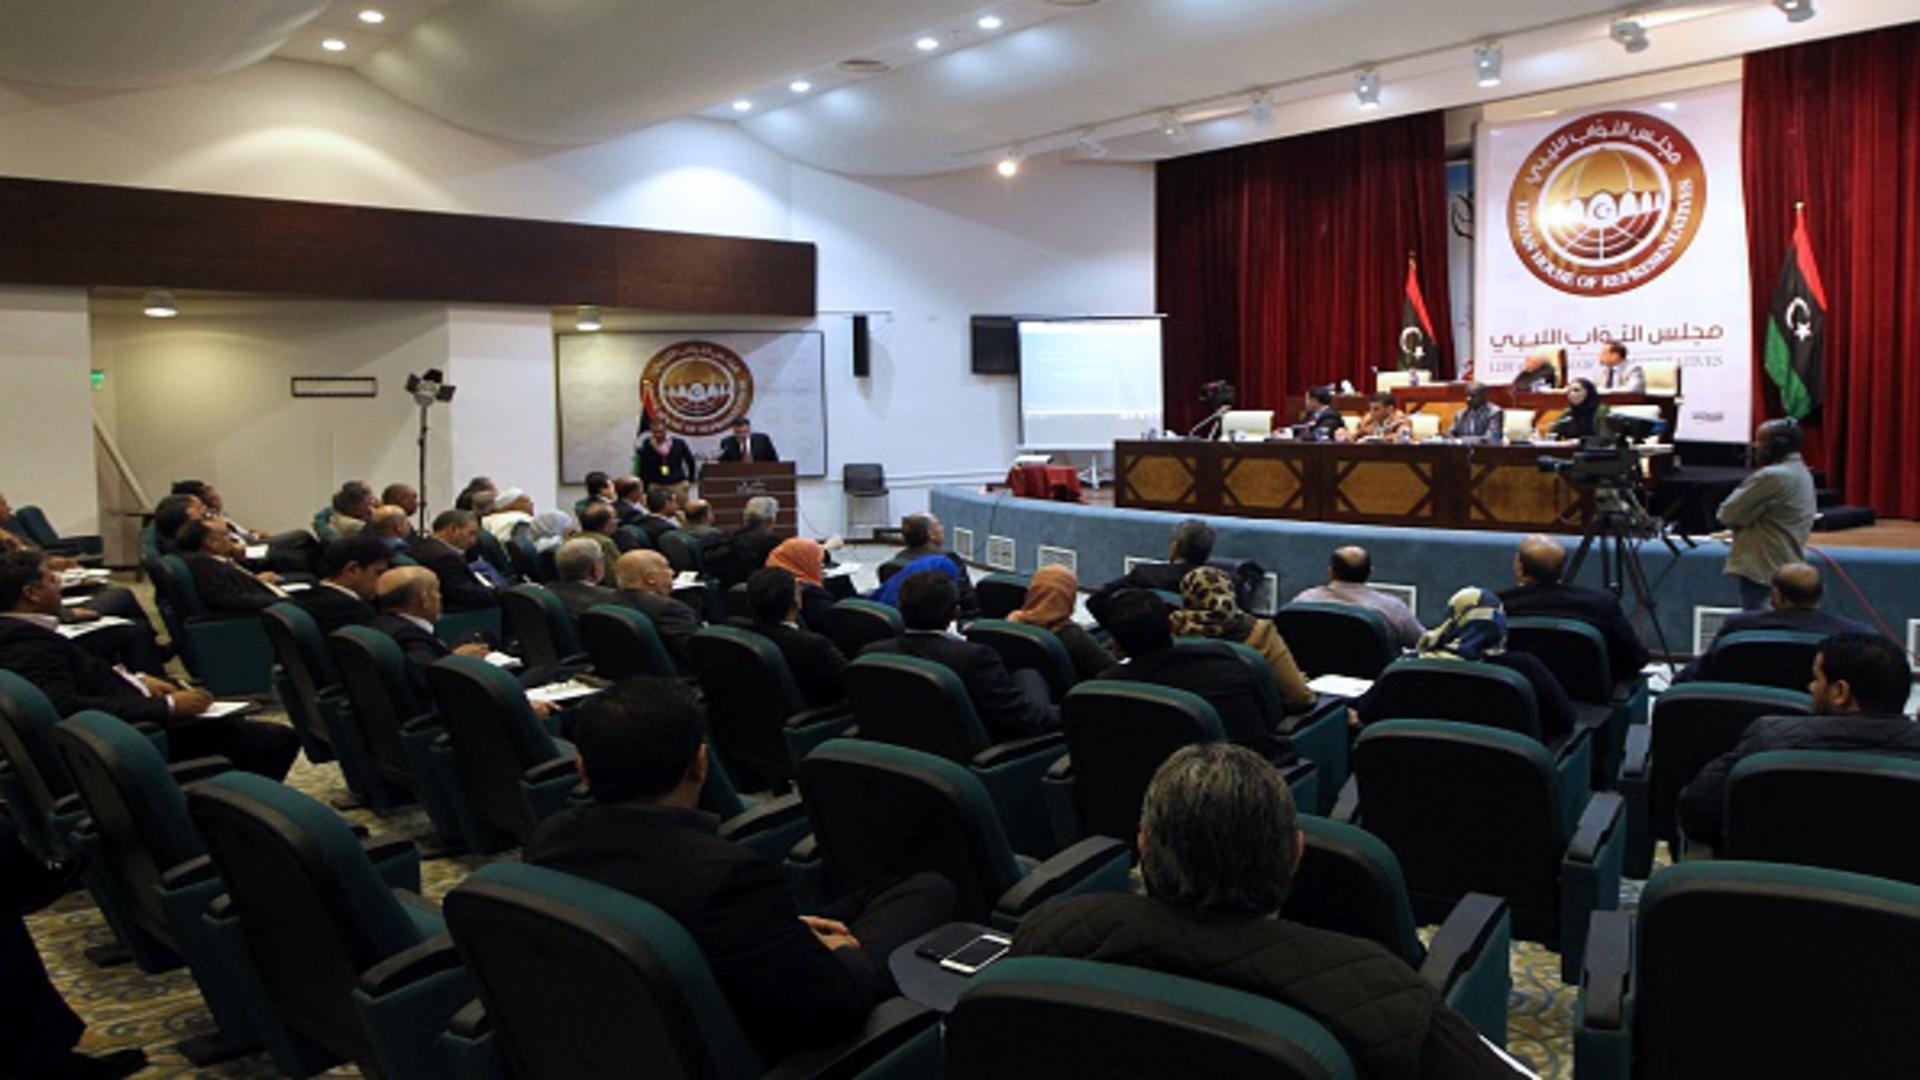 Photo of عبدالسيد يدعو النواب للاستعجال في إصدار قانون الاستفتاء